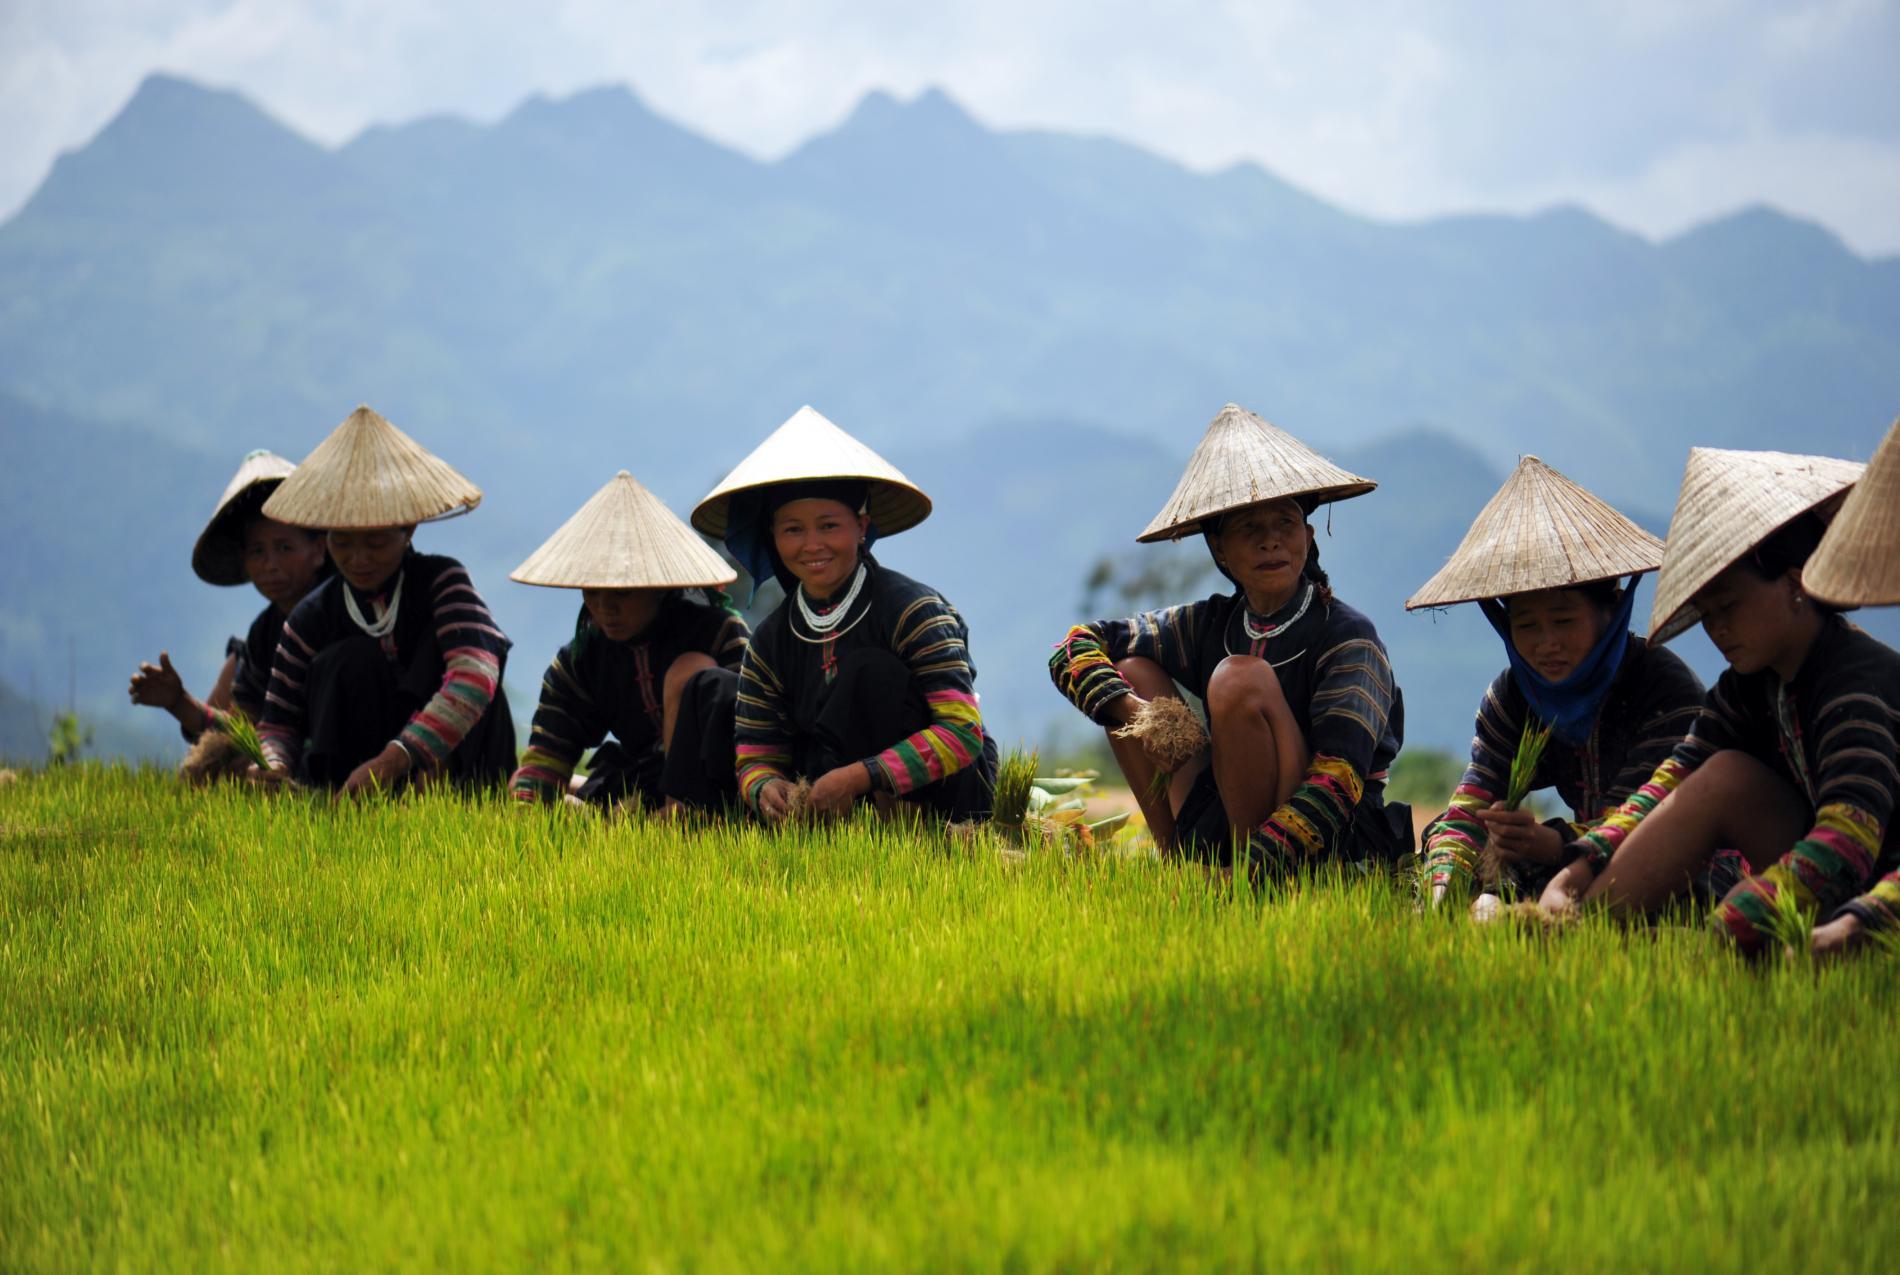 Voyage solidaire Vietnam : Vision du Monde - Photo 5